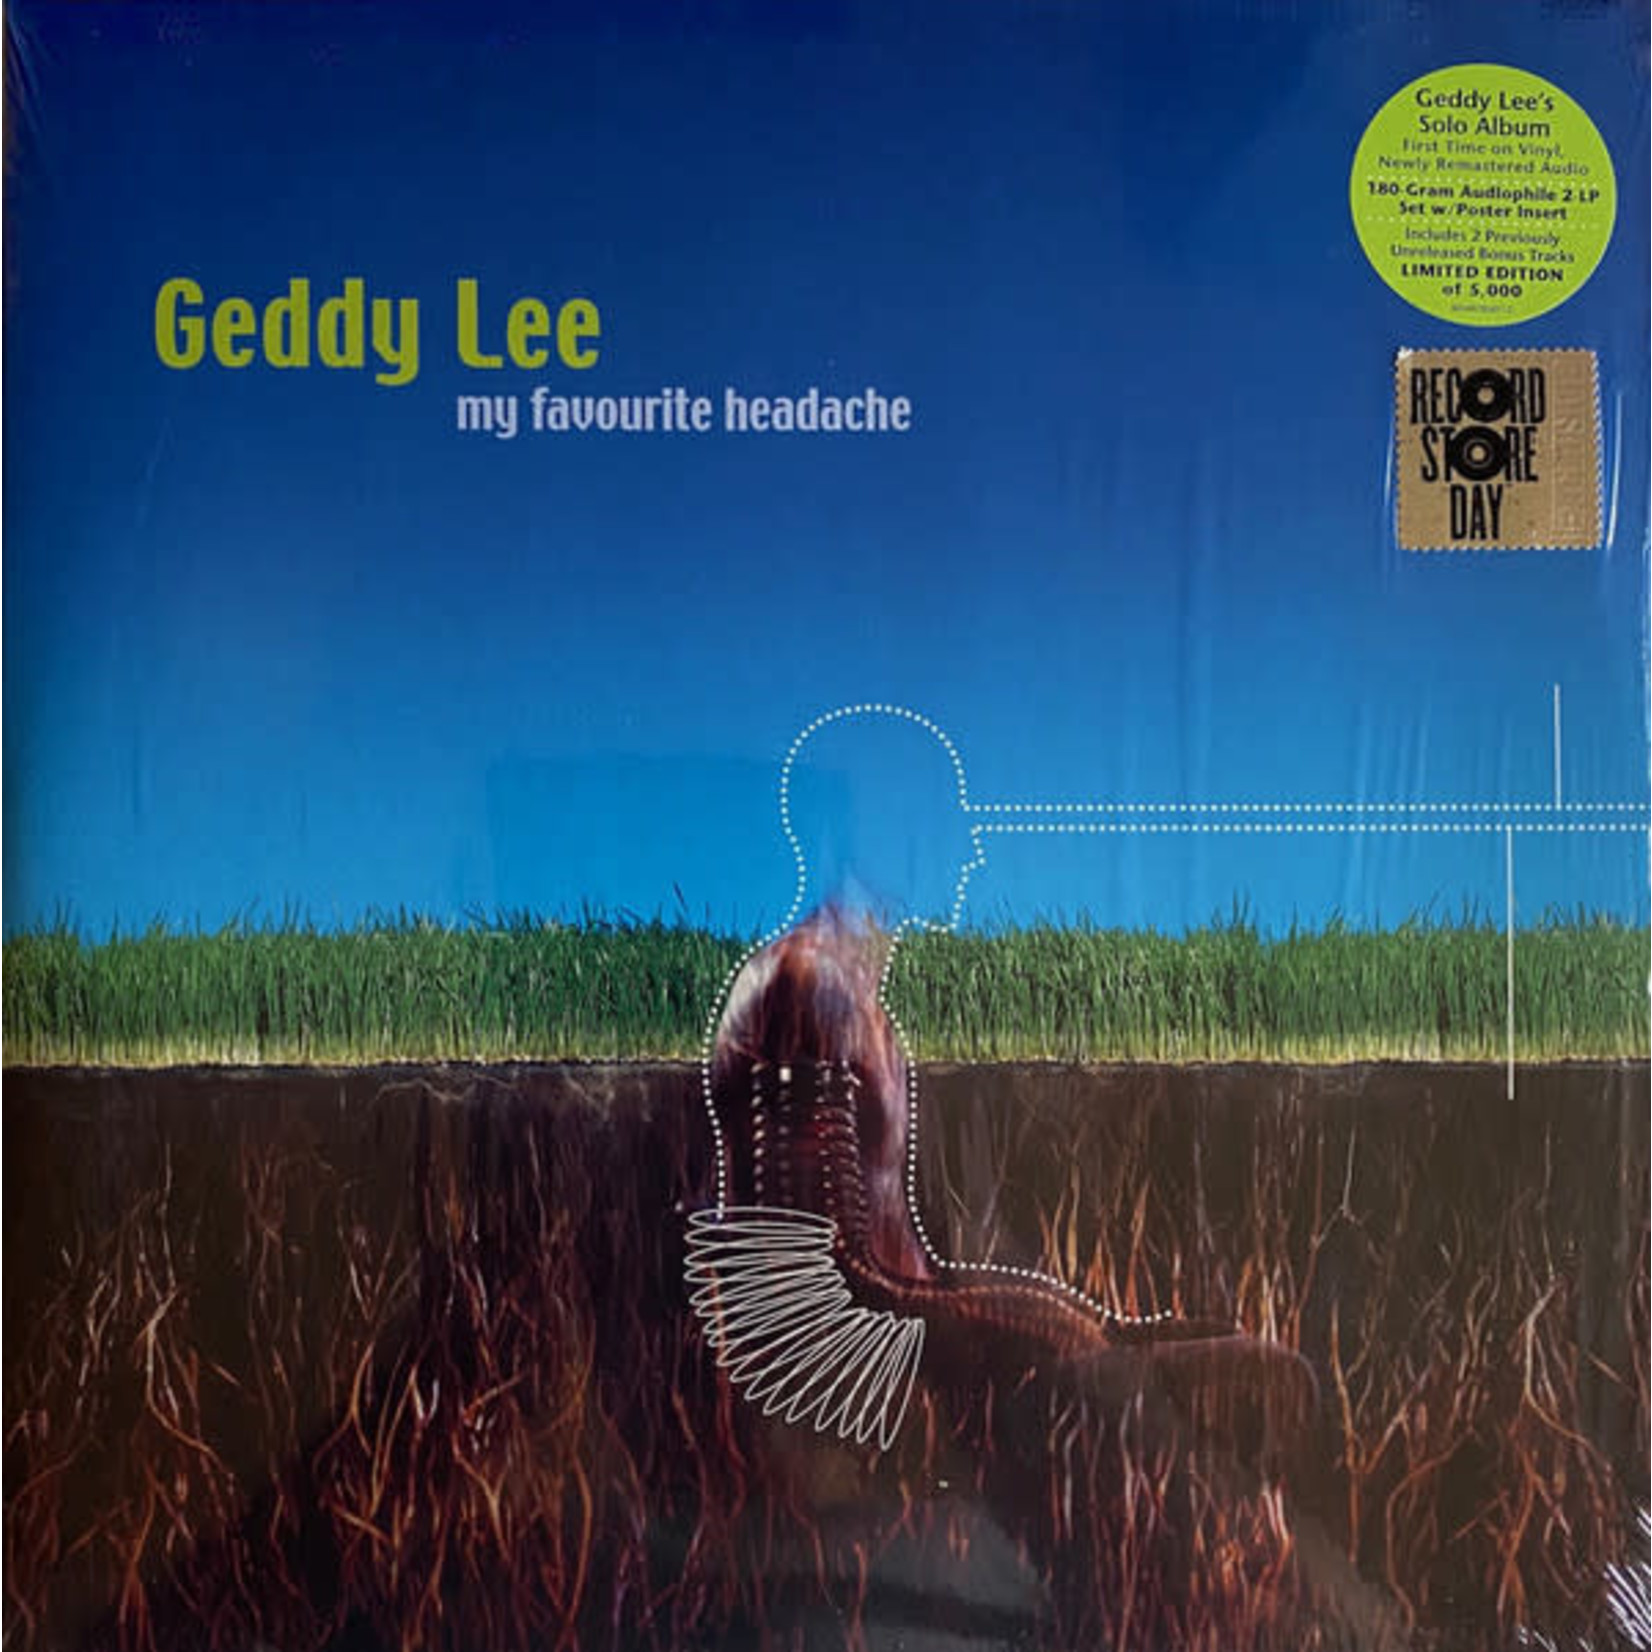 GEDDY LEE 66.99